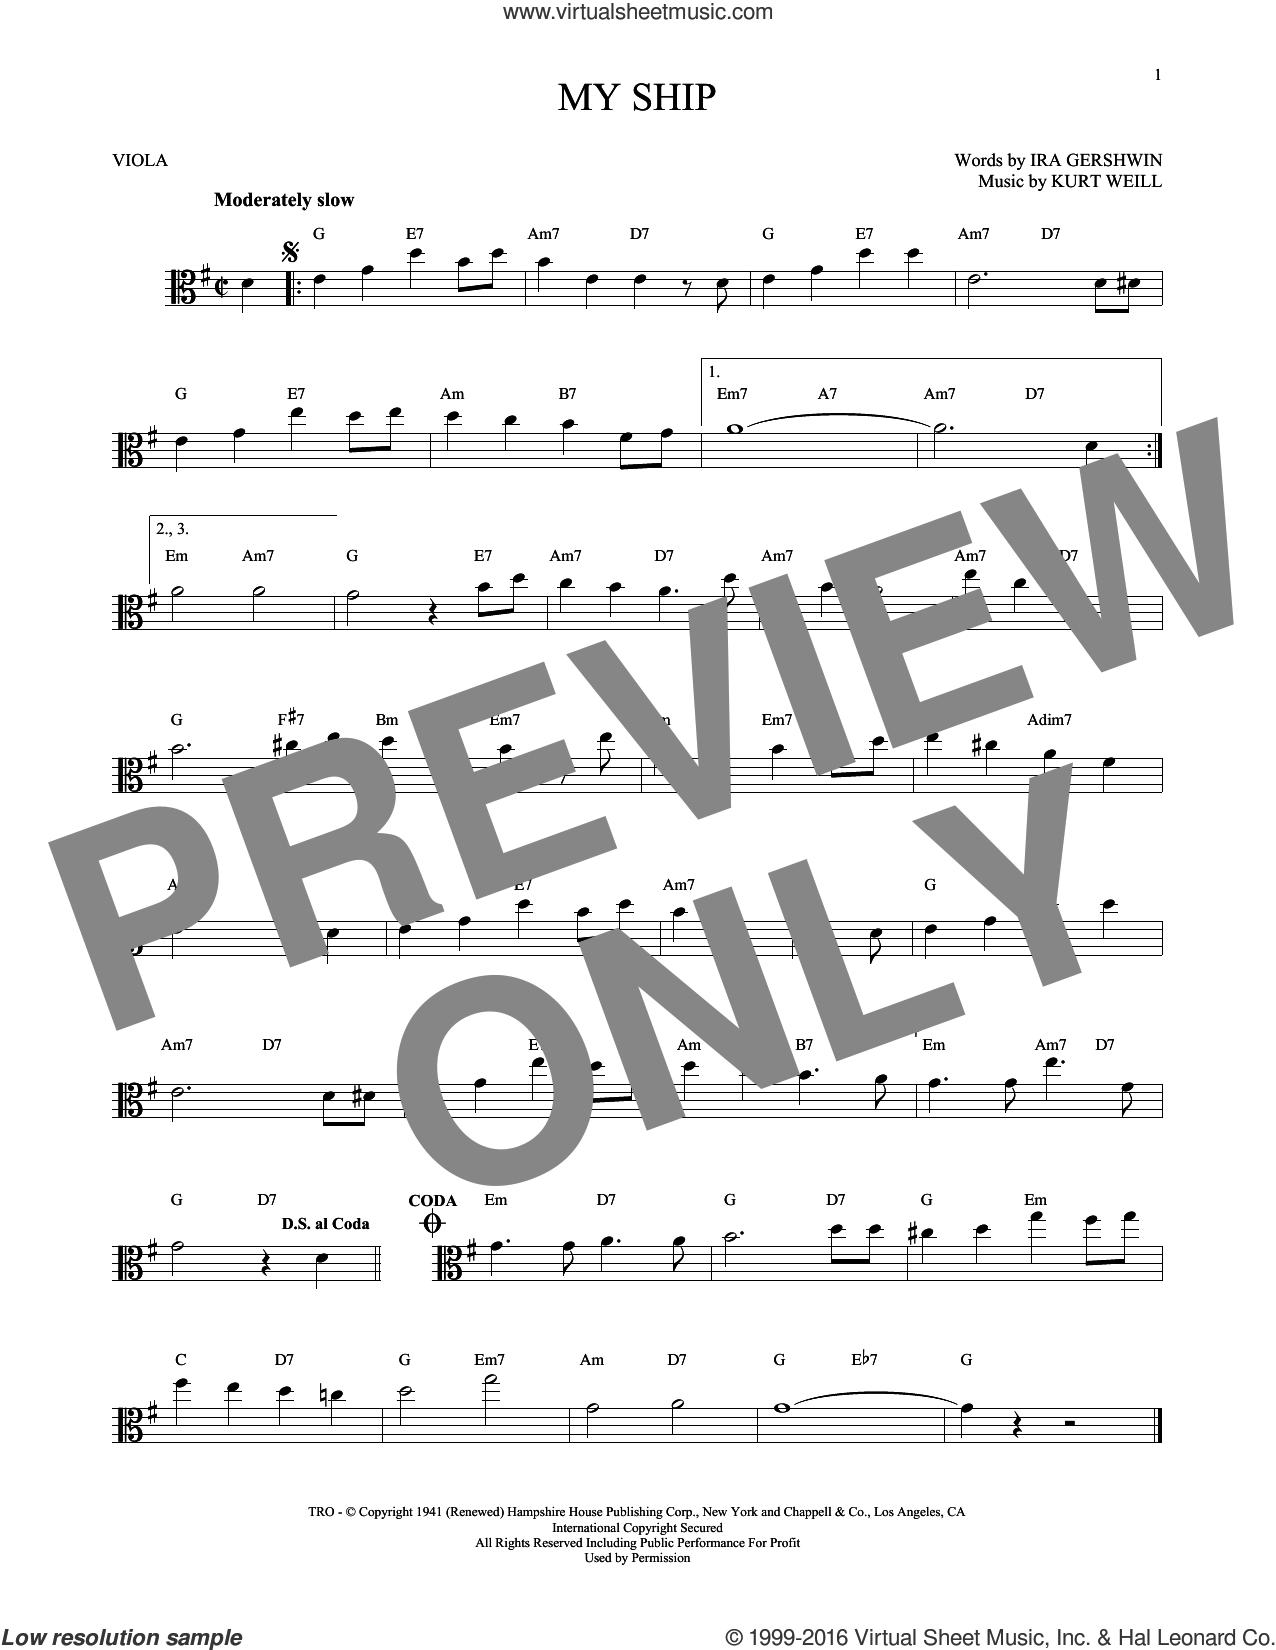 My Ship sheet music for viola solo by Ira Gershwin and Kurt Weill, intermediate skill level